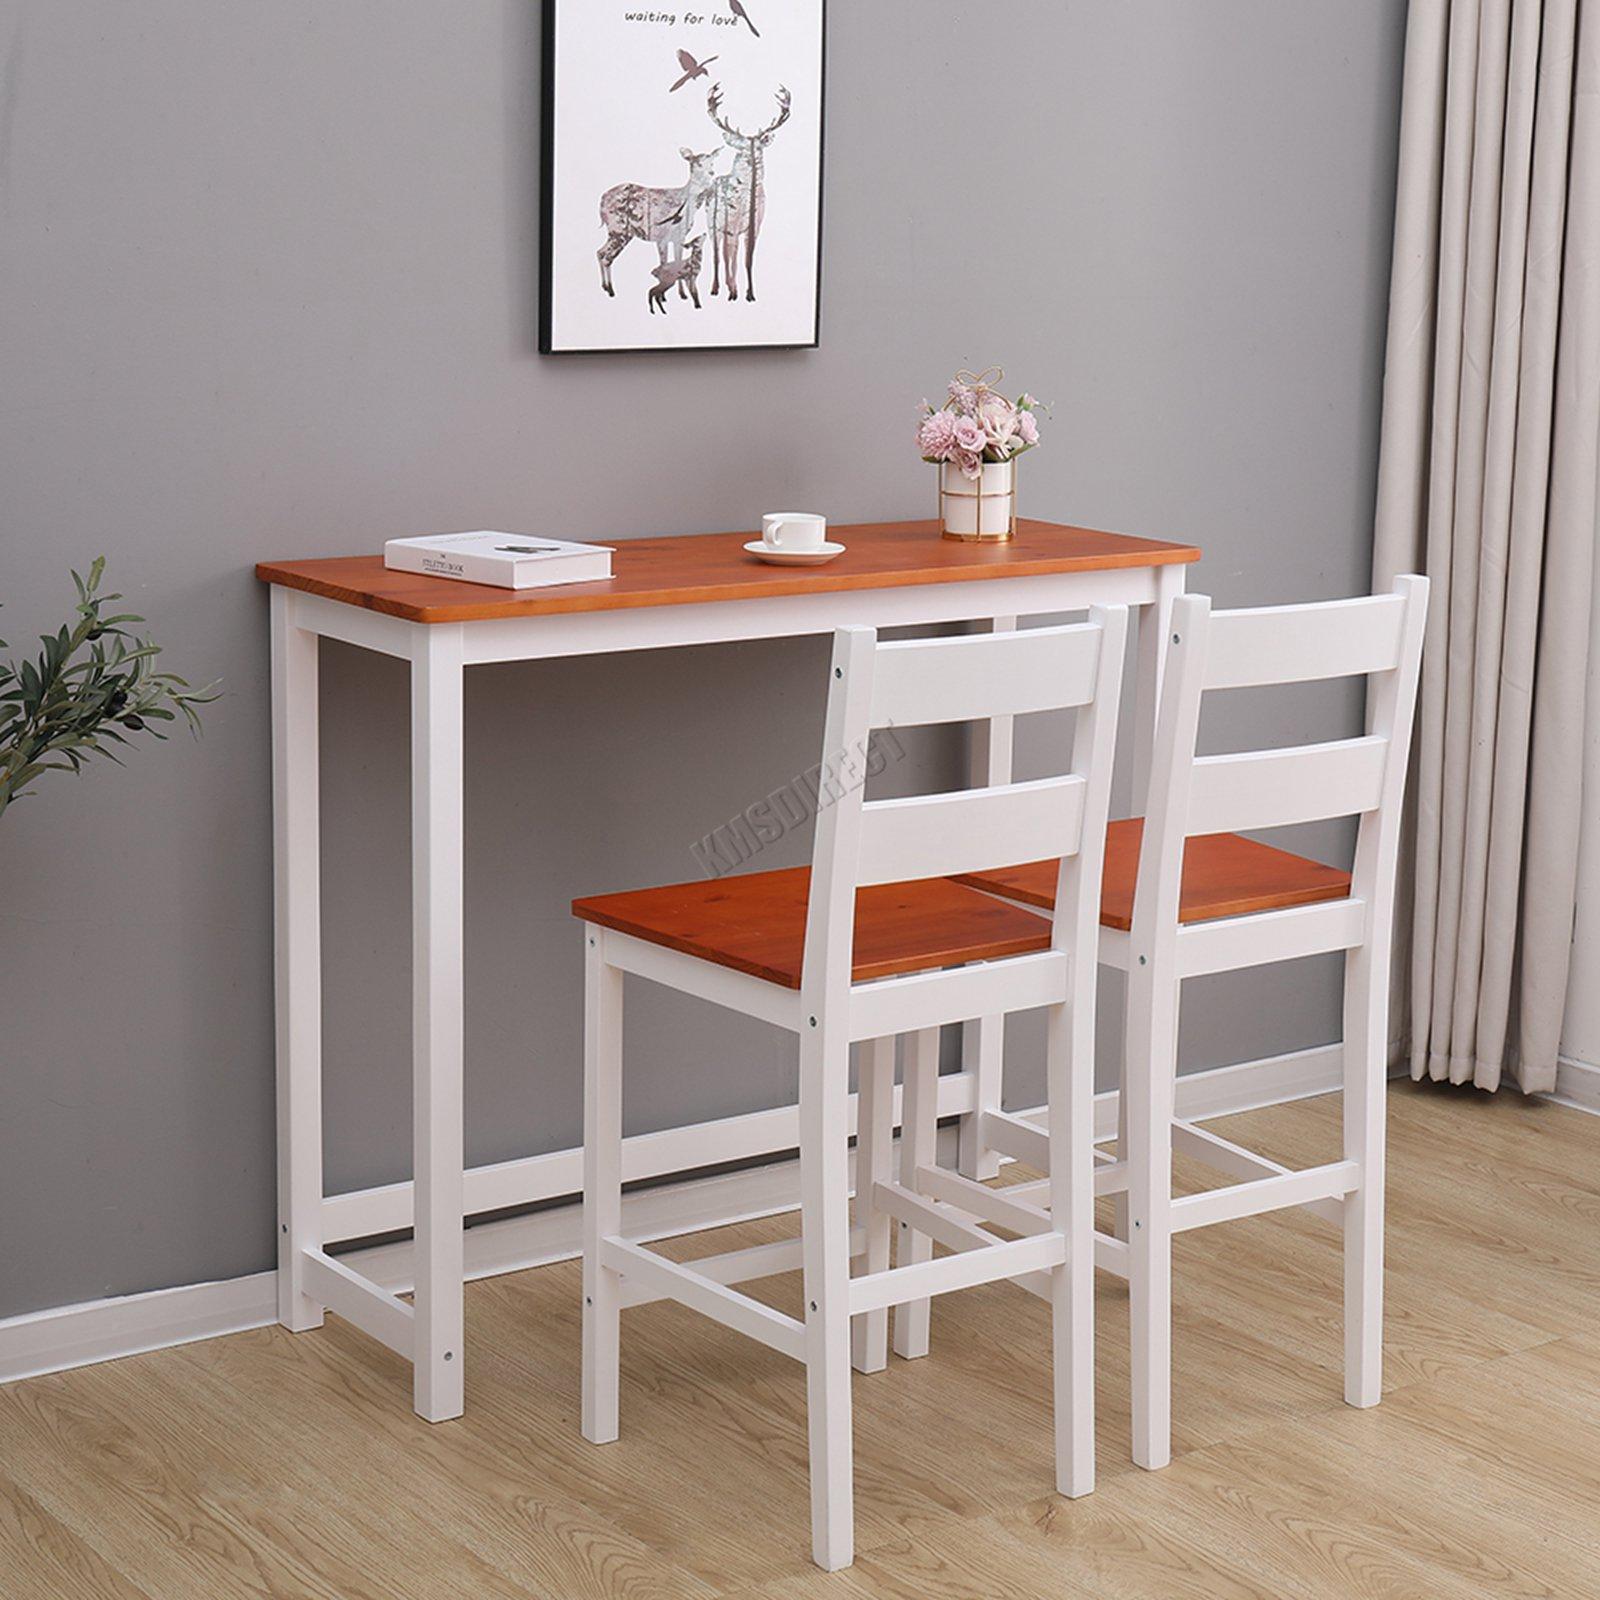 WestWood Breakfast Bar Table 2 X Stools Set Solid Pine ...